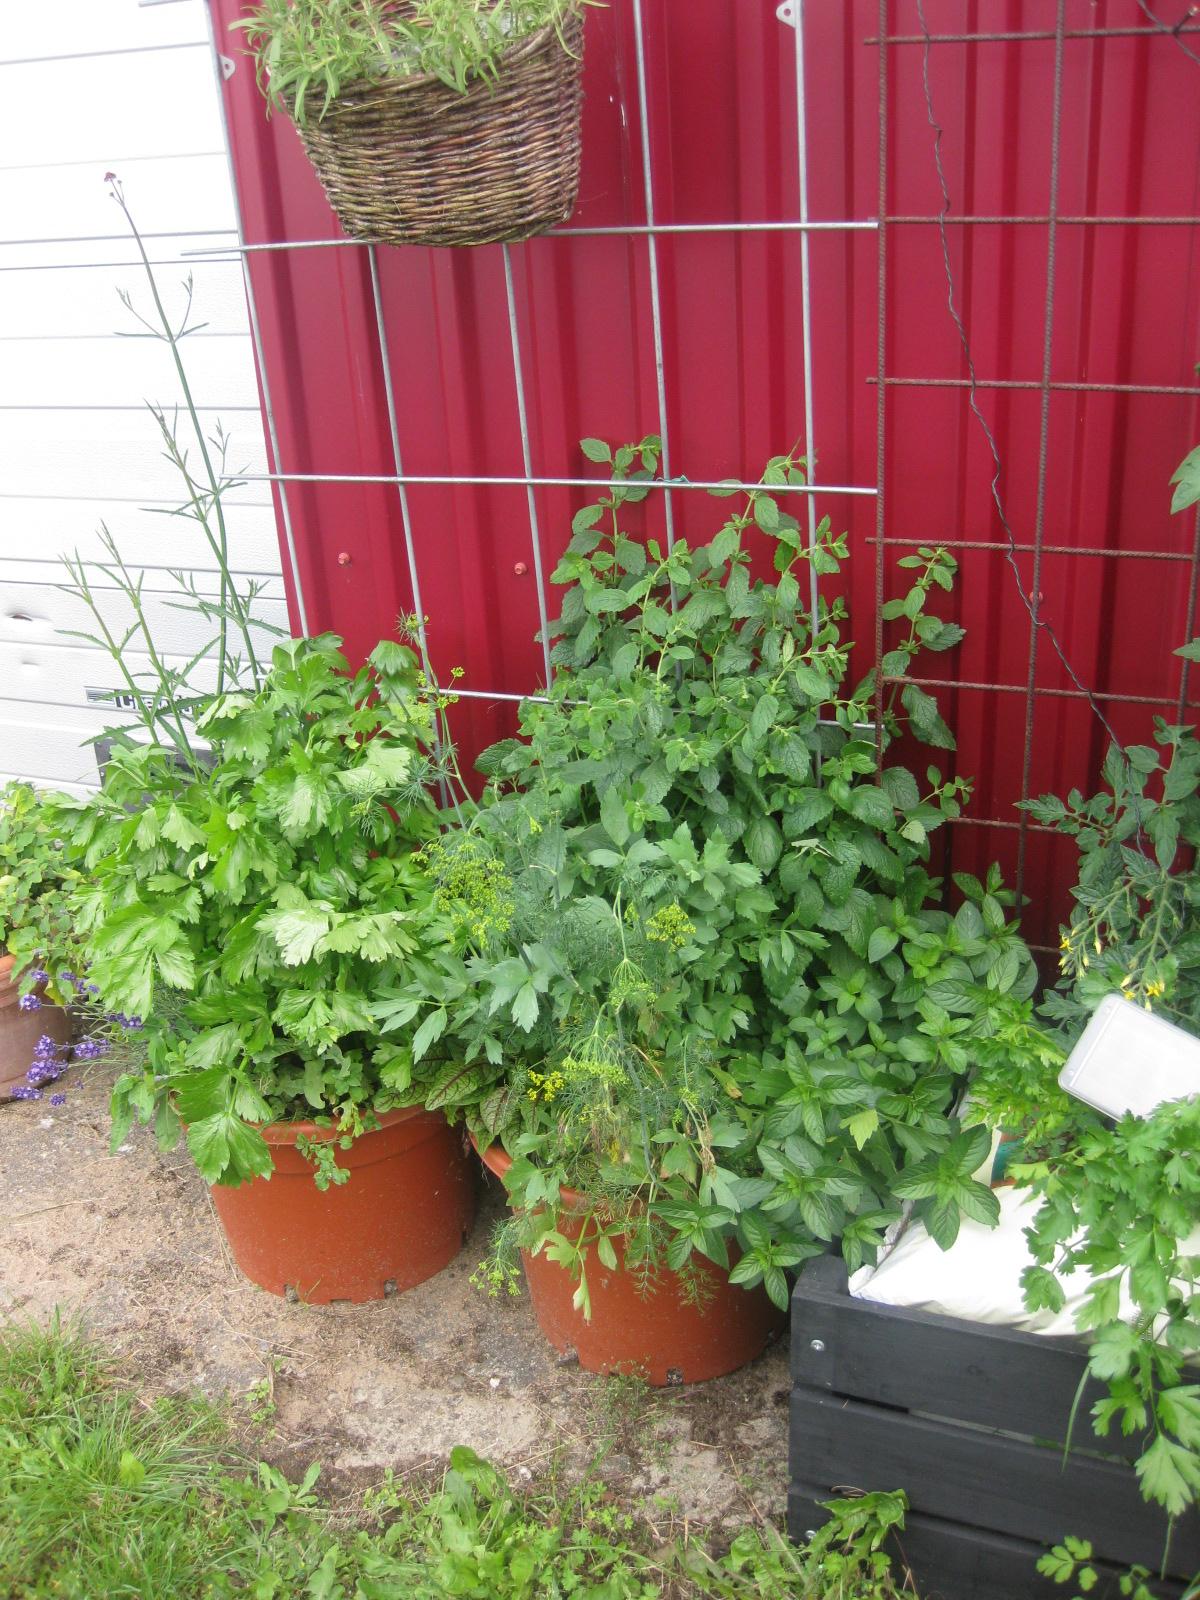 plantesæk til kartofler